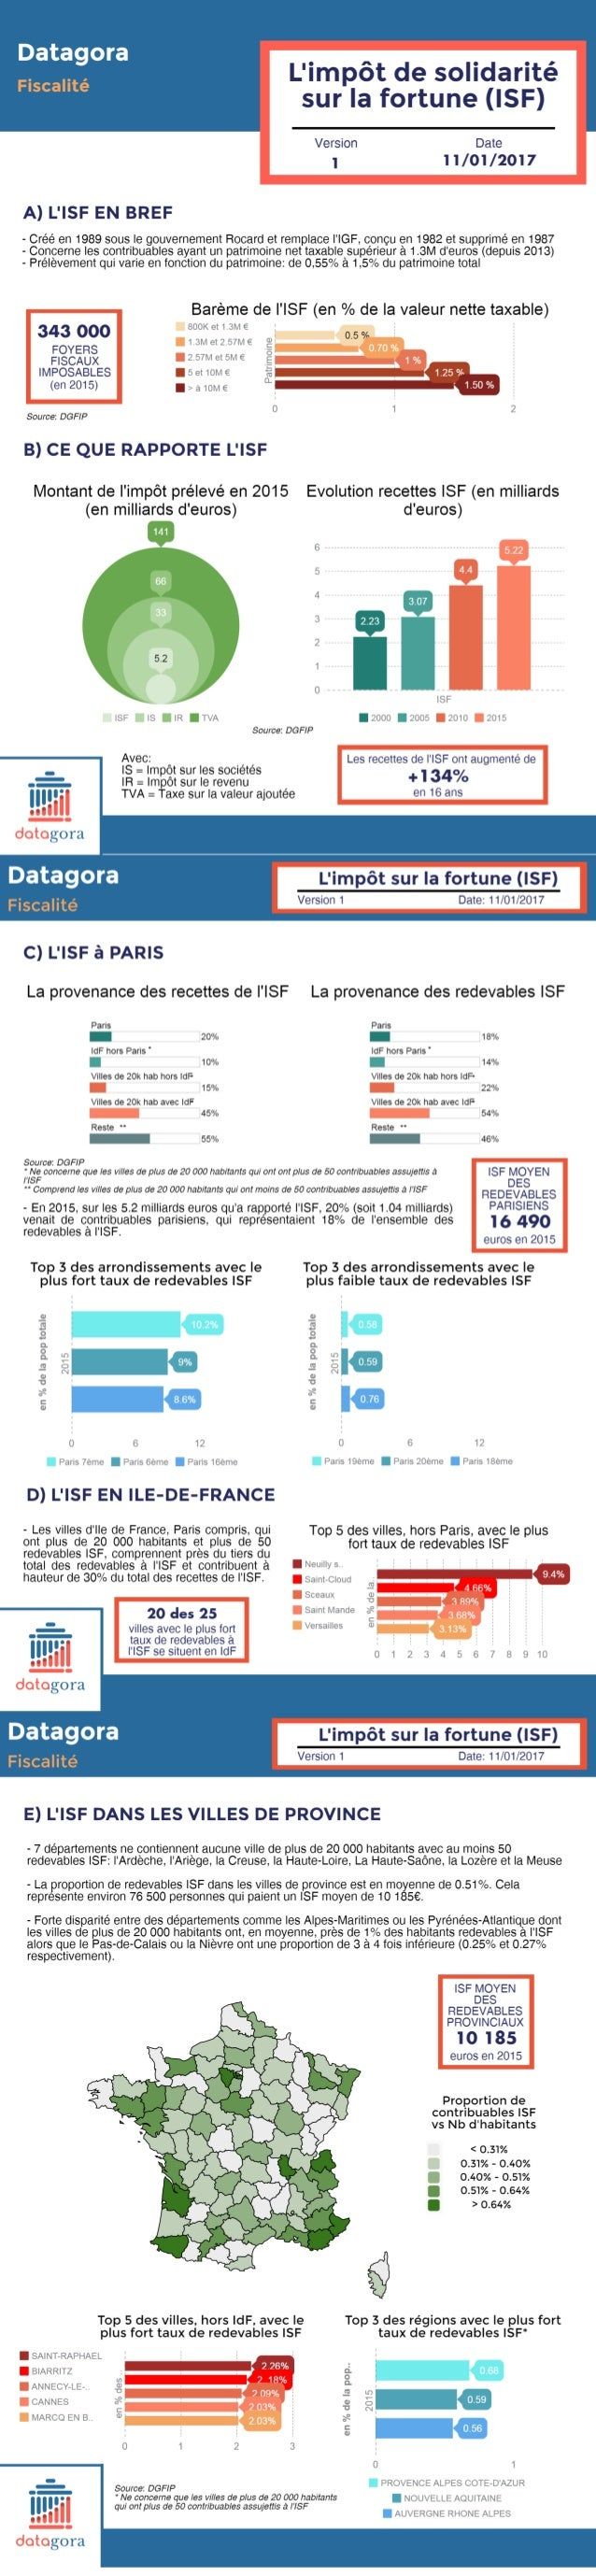 Infographie ISF Datagora V1 - Janvier 2017